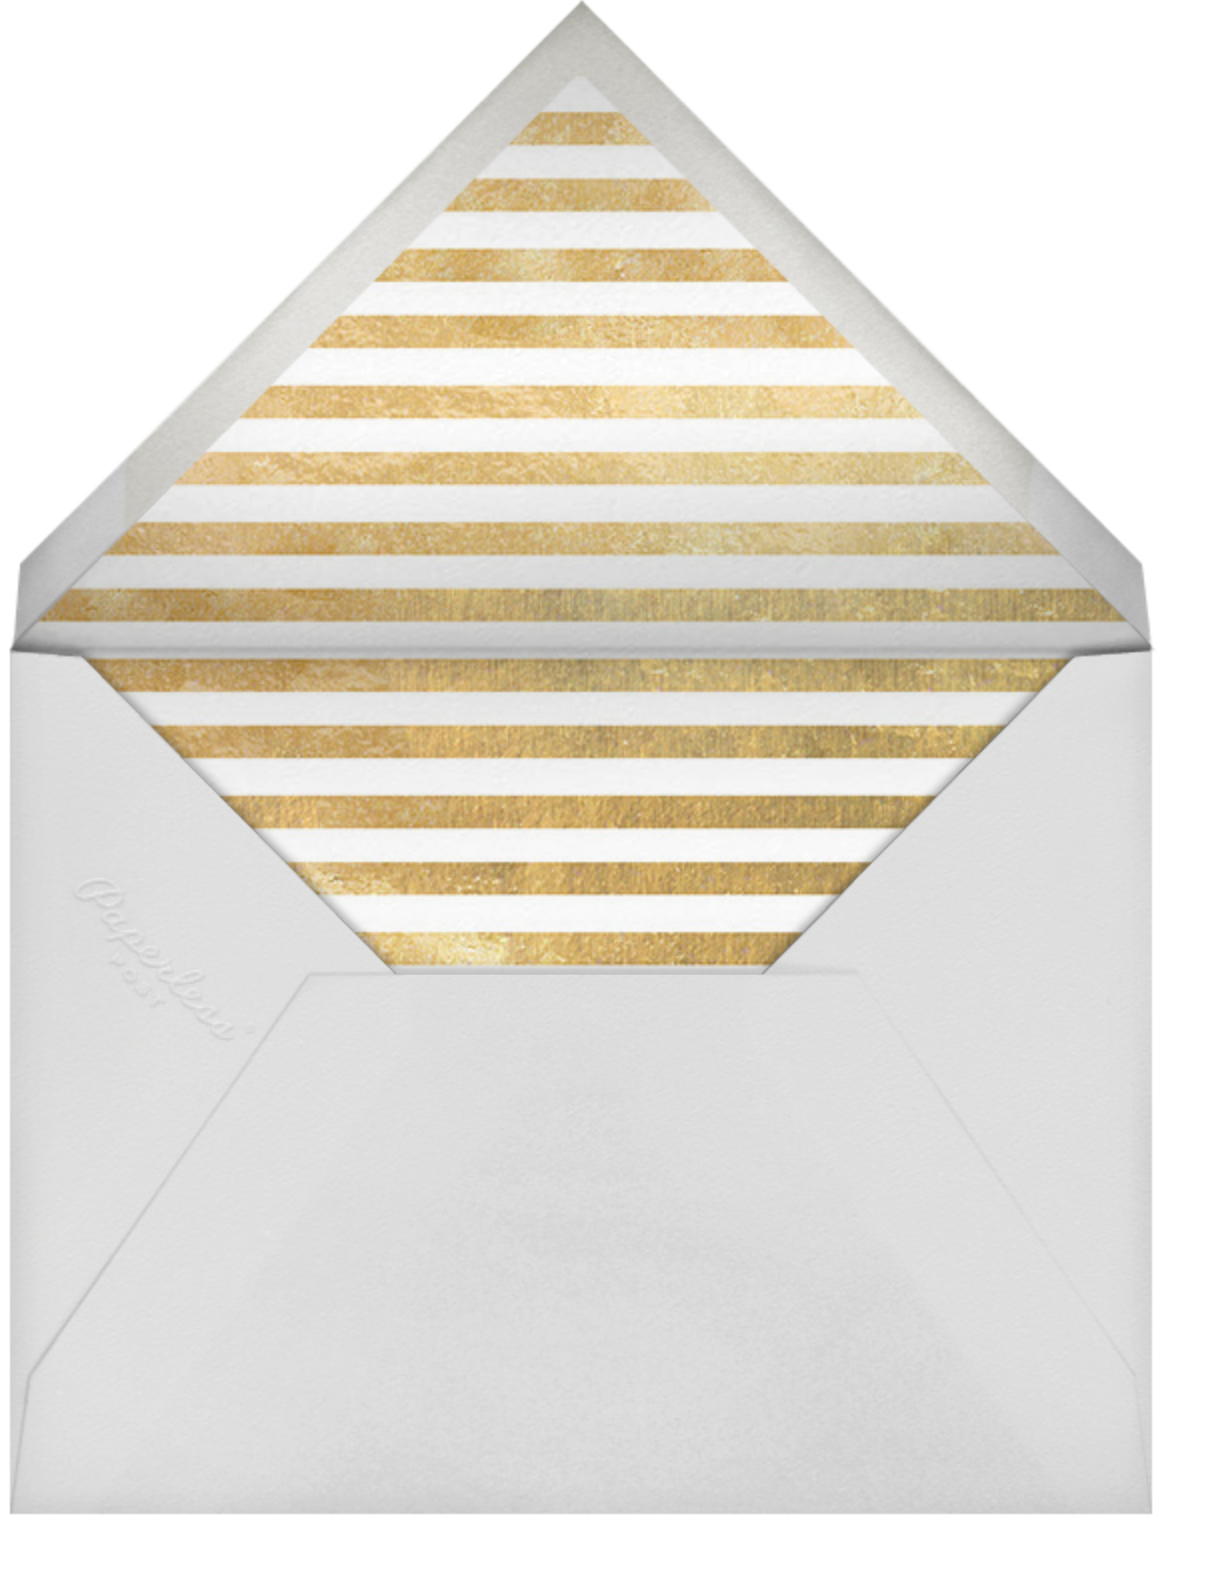 Classic Vintage - Gold/Black - kate spade new york - Engagement party - envelope back